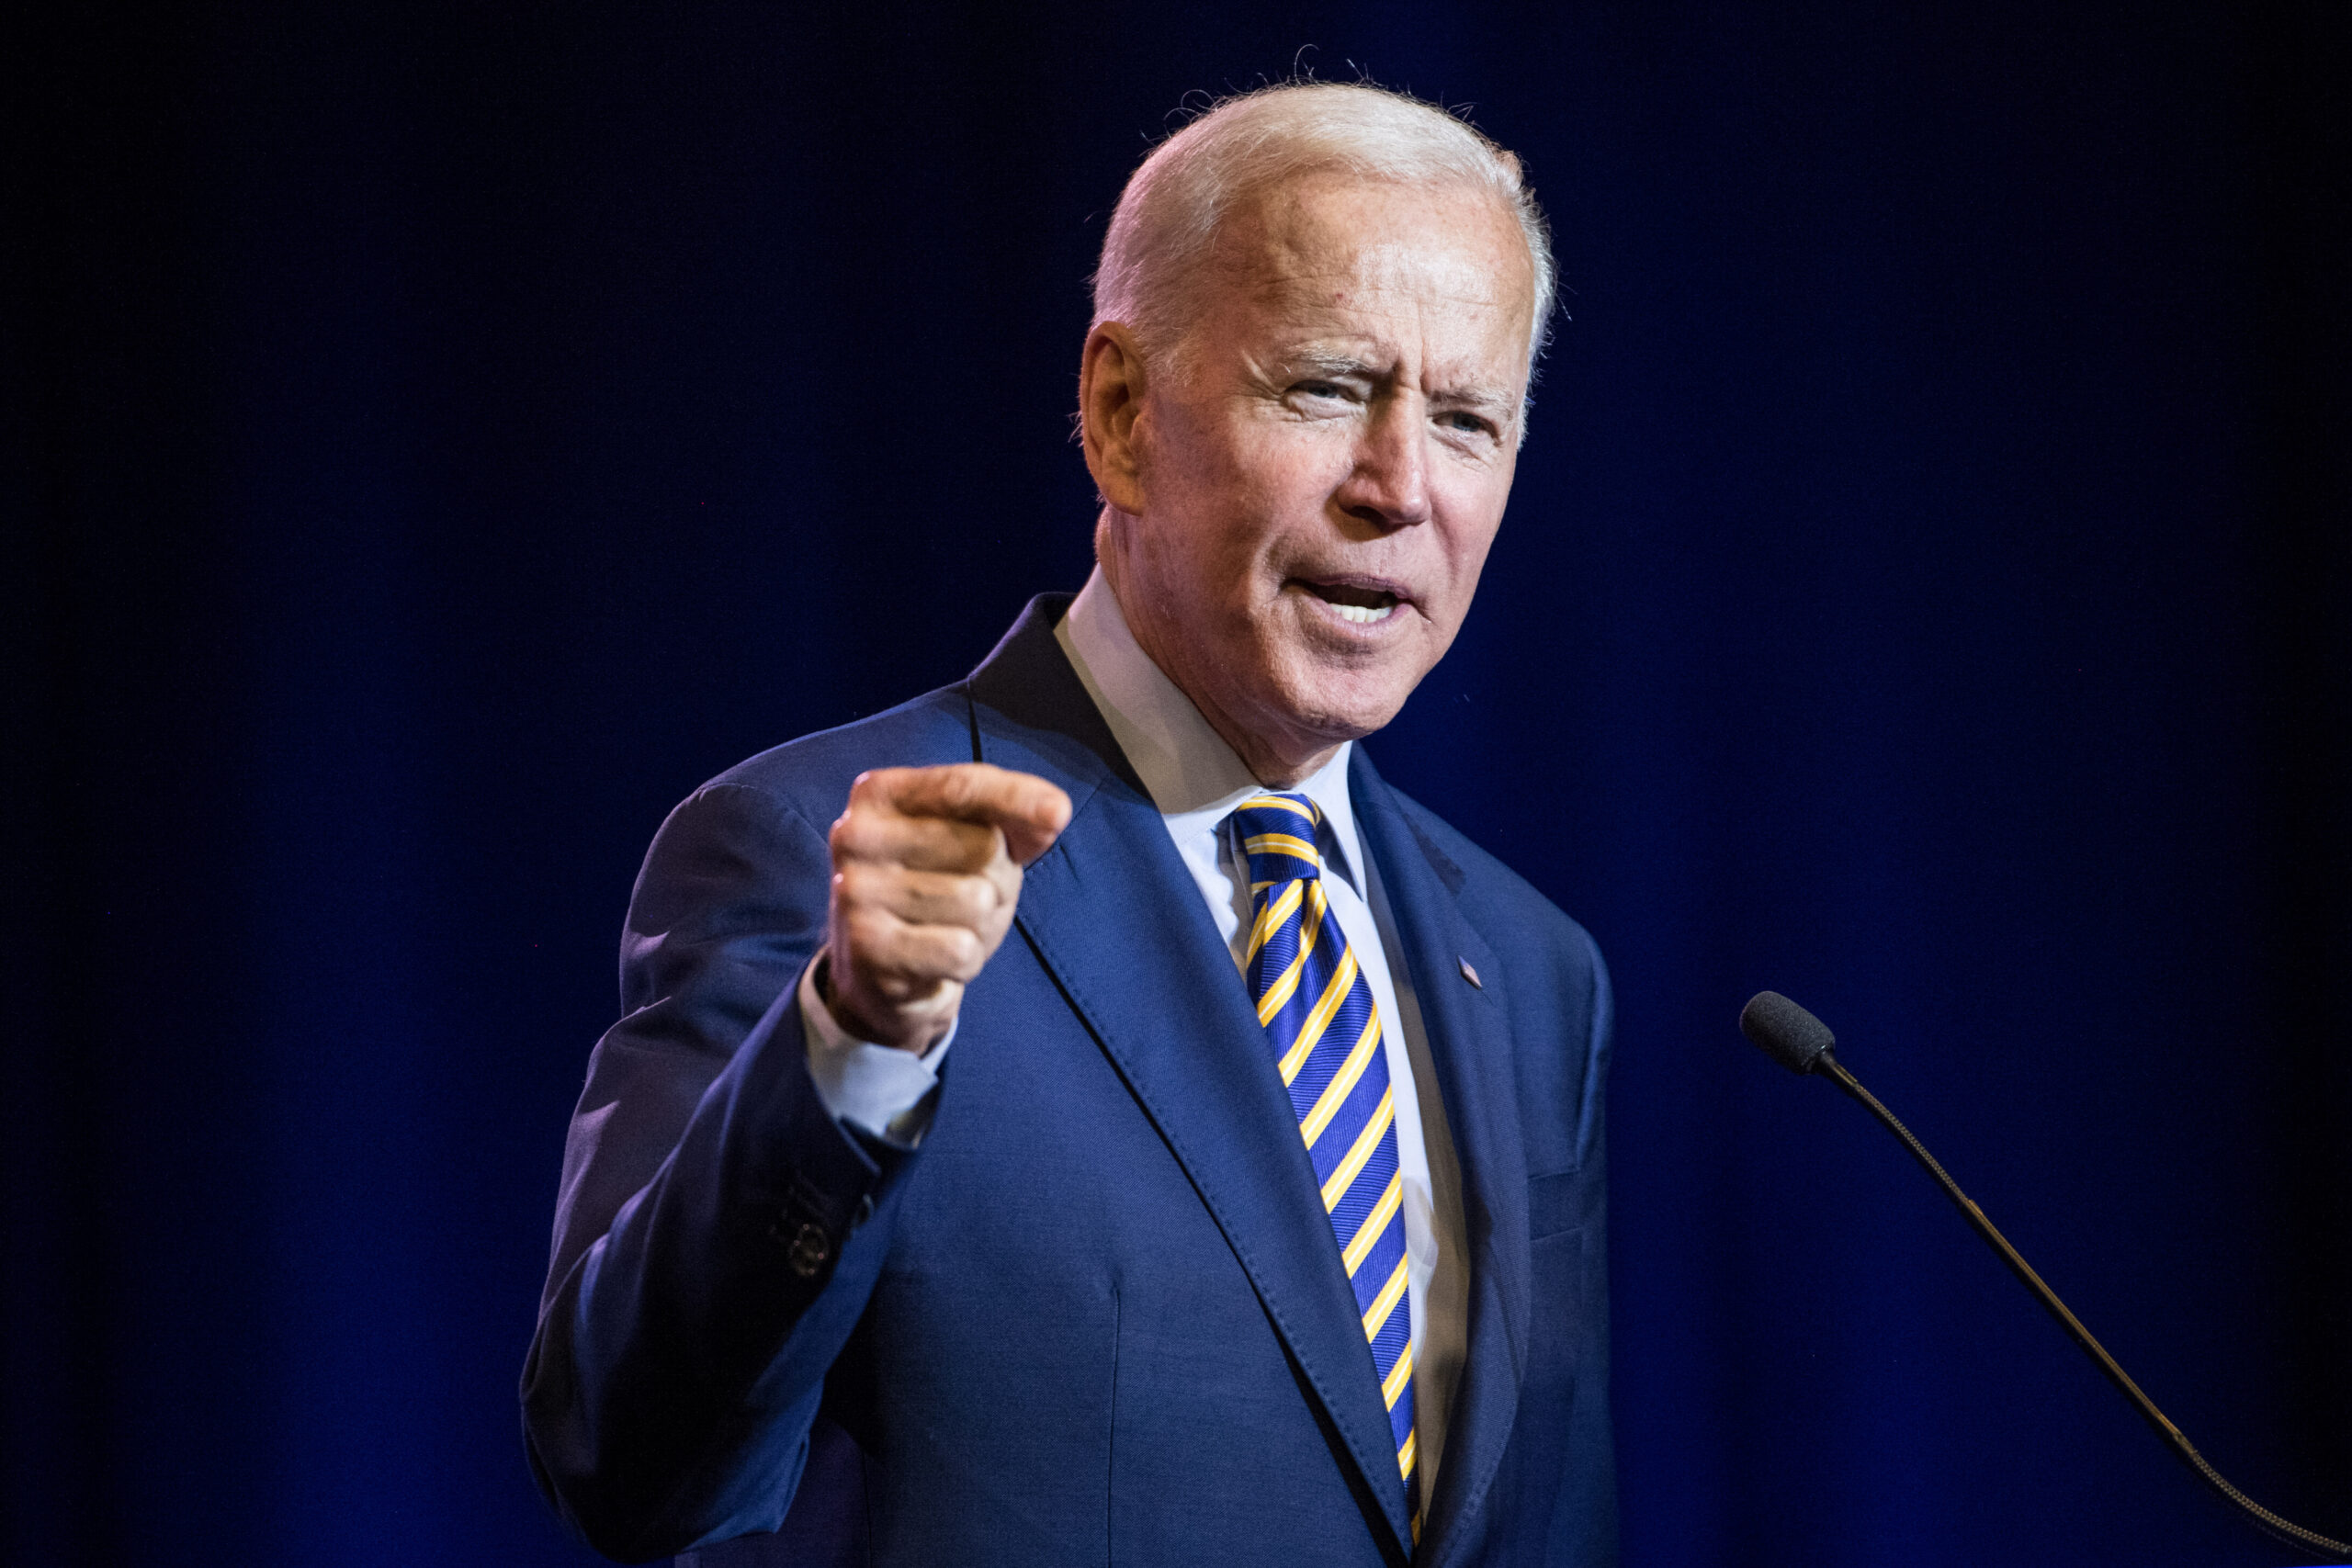 Biden puts an end to US's longest war, orders troops withdrawal by September 11